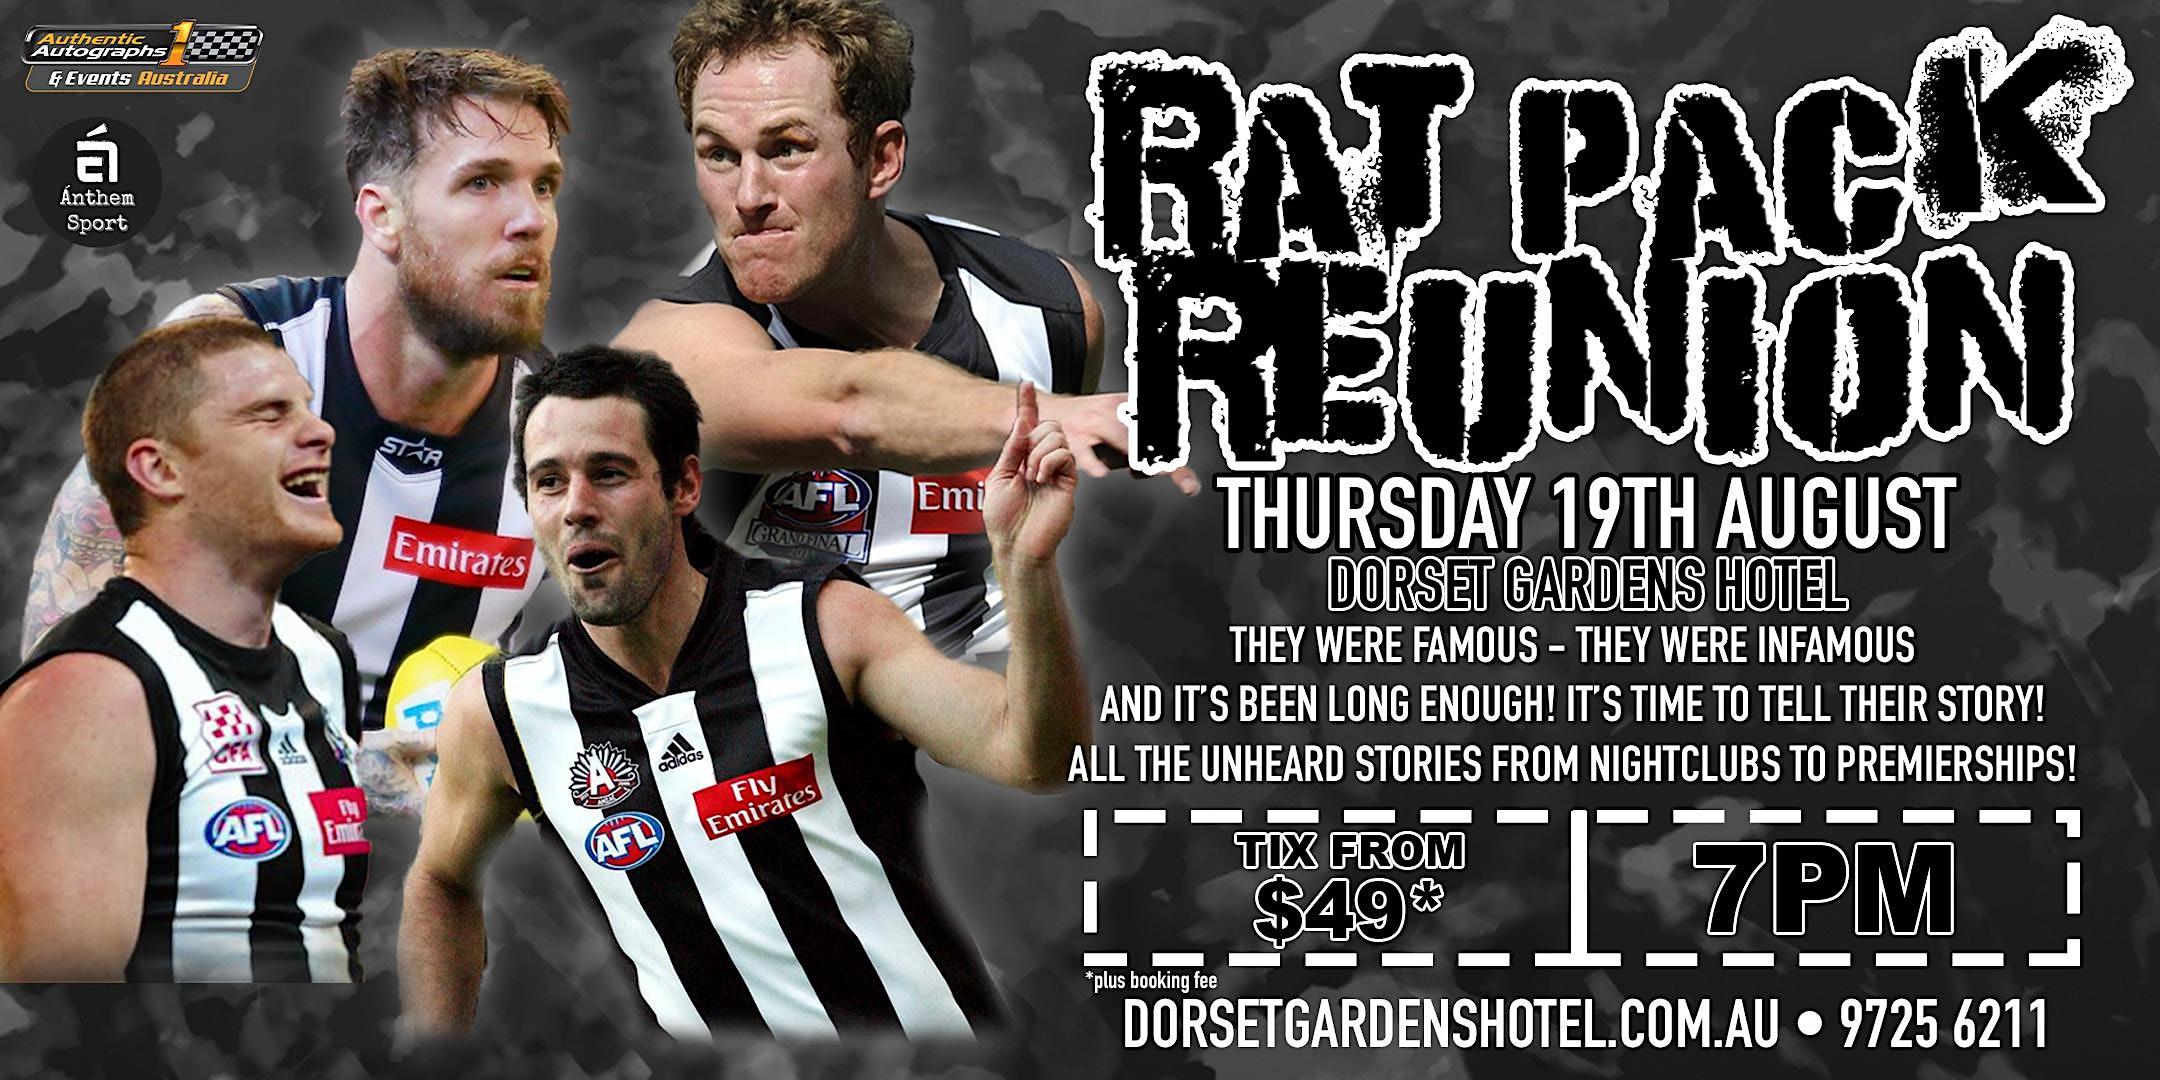 Rat Pack Reunion feat Swanny, Shaw, Didak & Johnson at Dorset Gardens Hotel